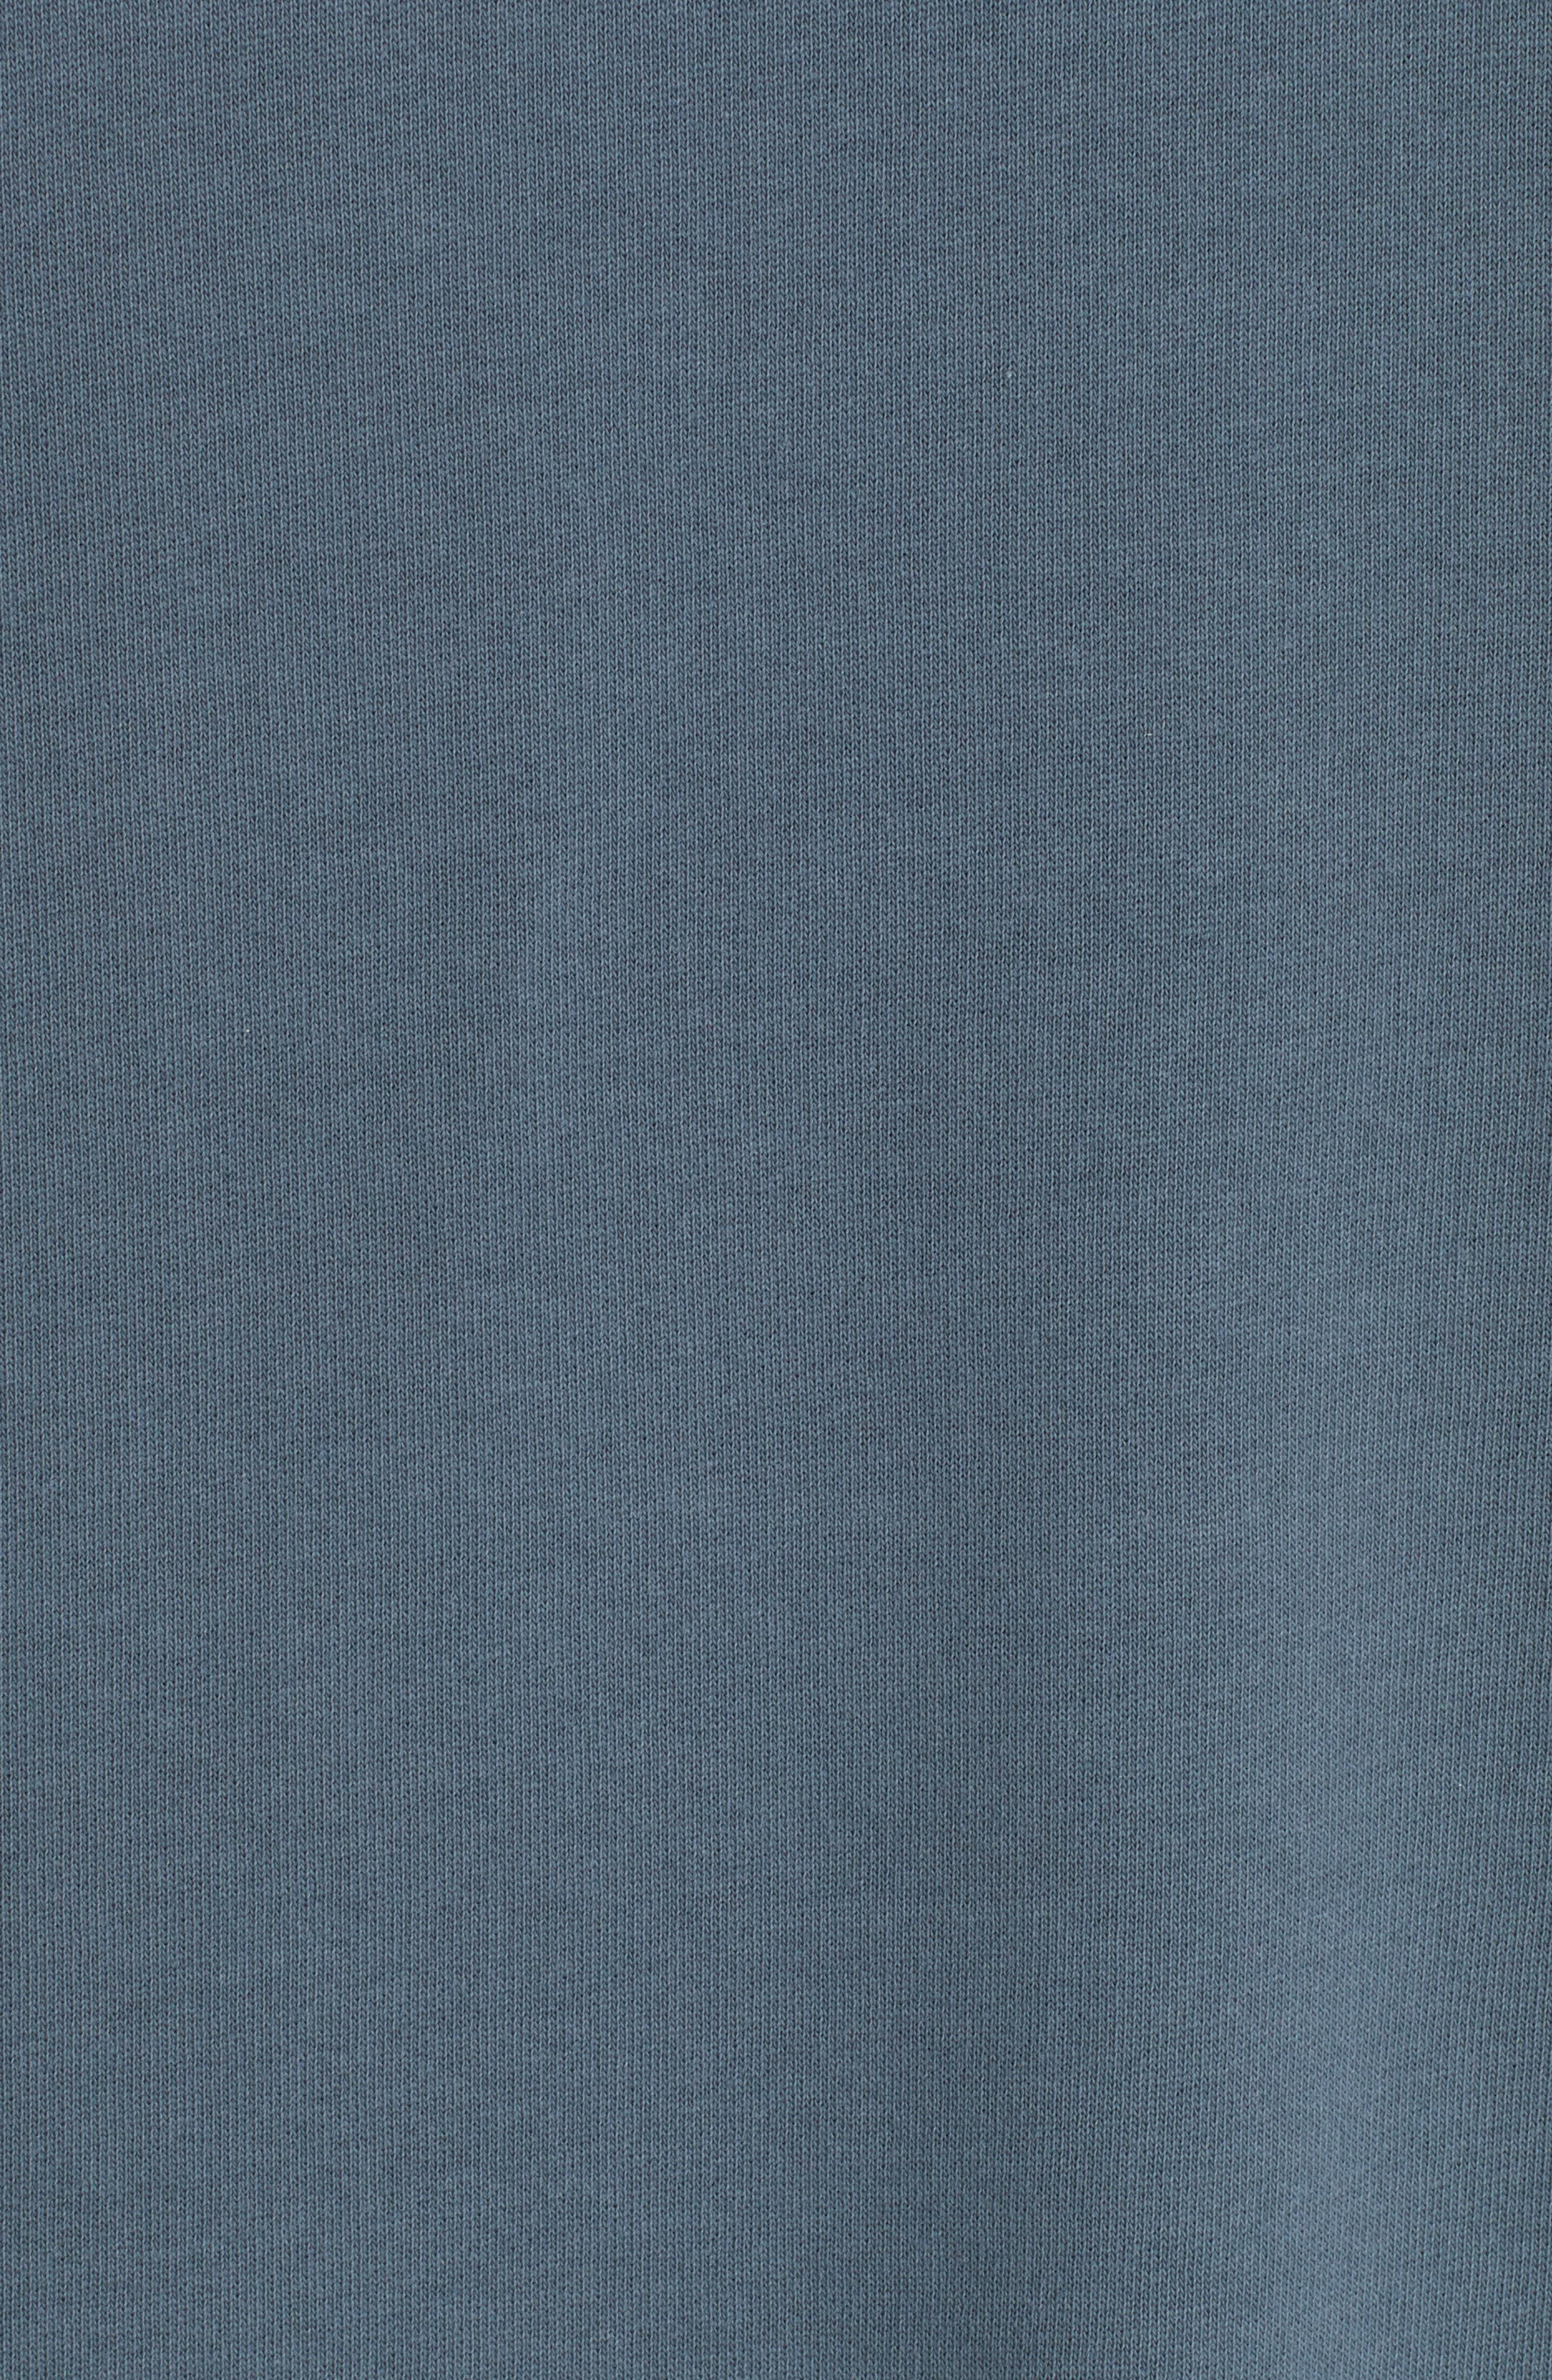 Fleece Knit Sweatshirt,                             Alternate thumbnail 5, color,                             GREY